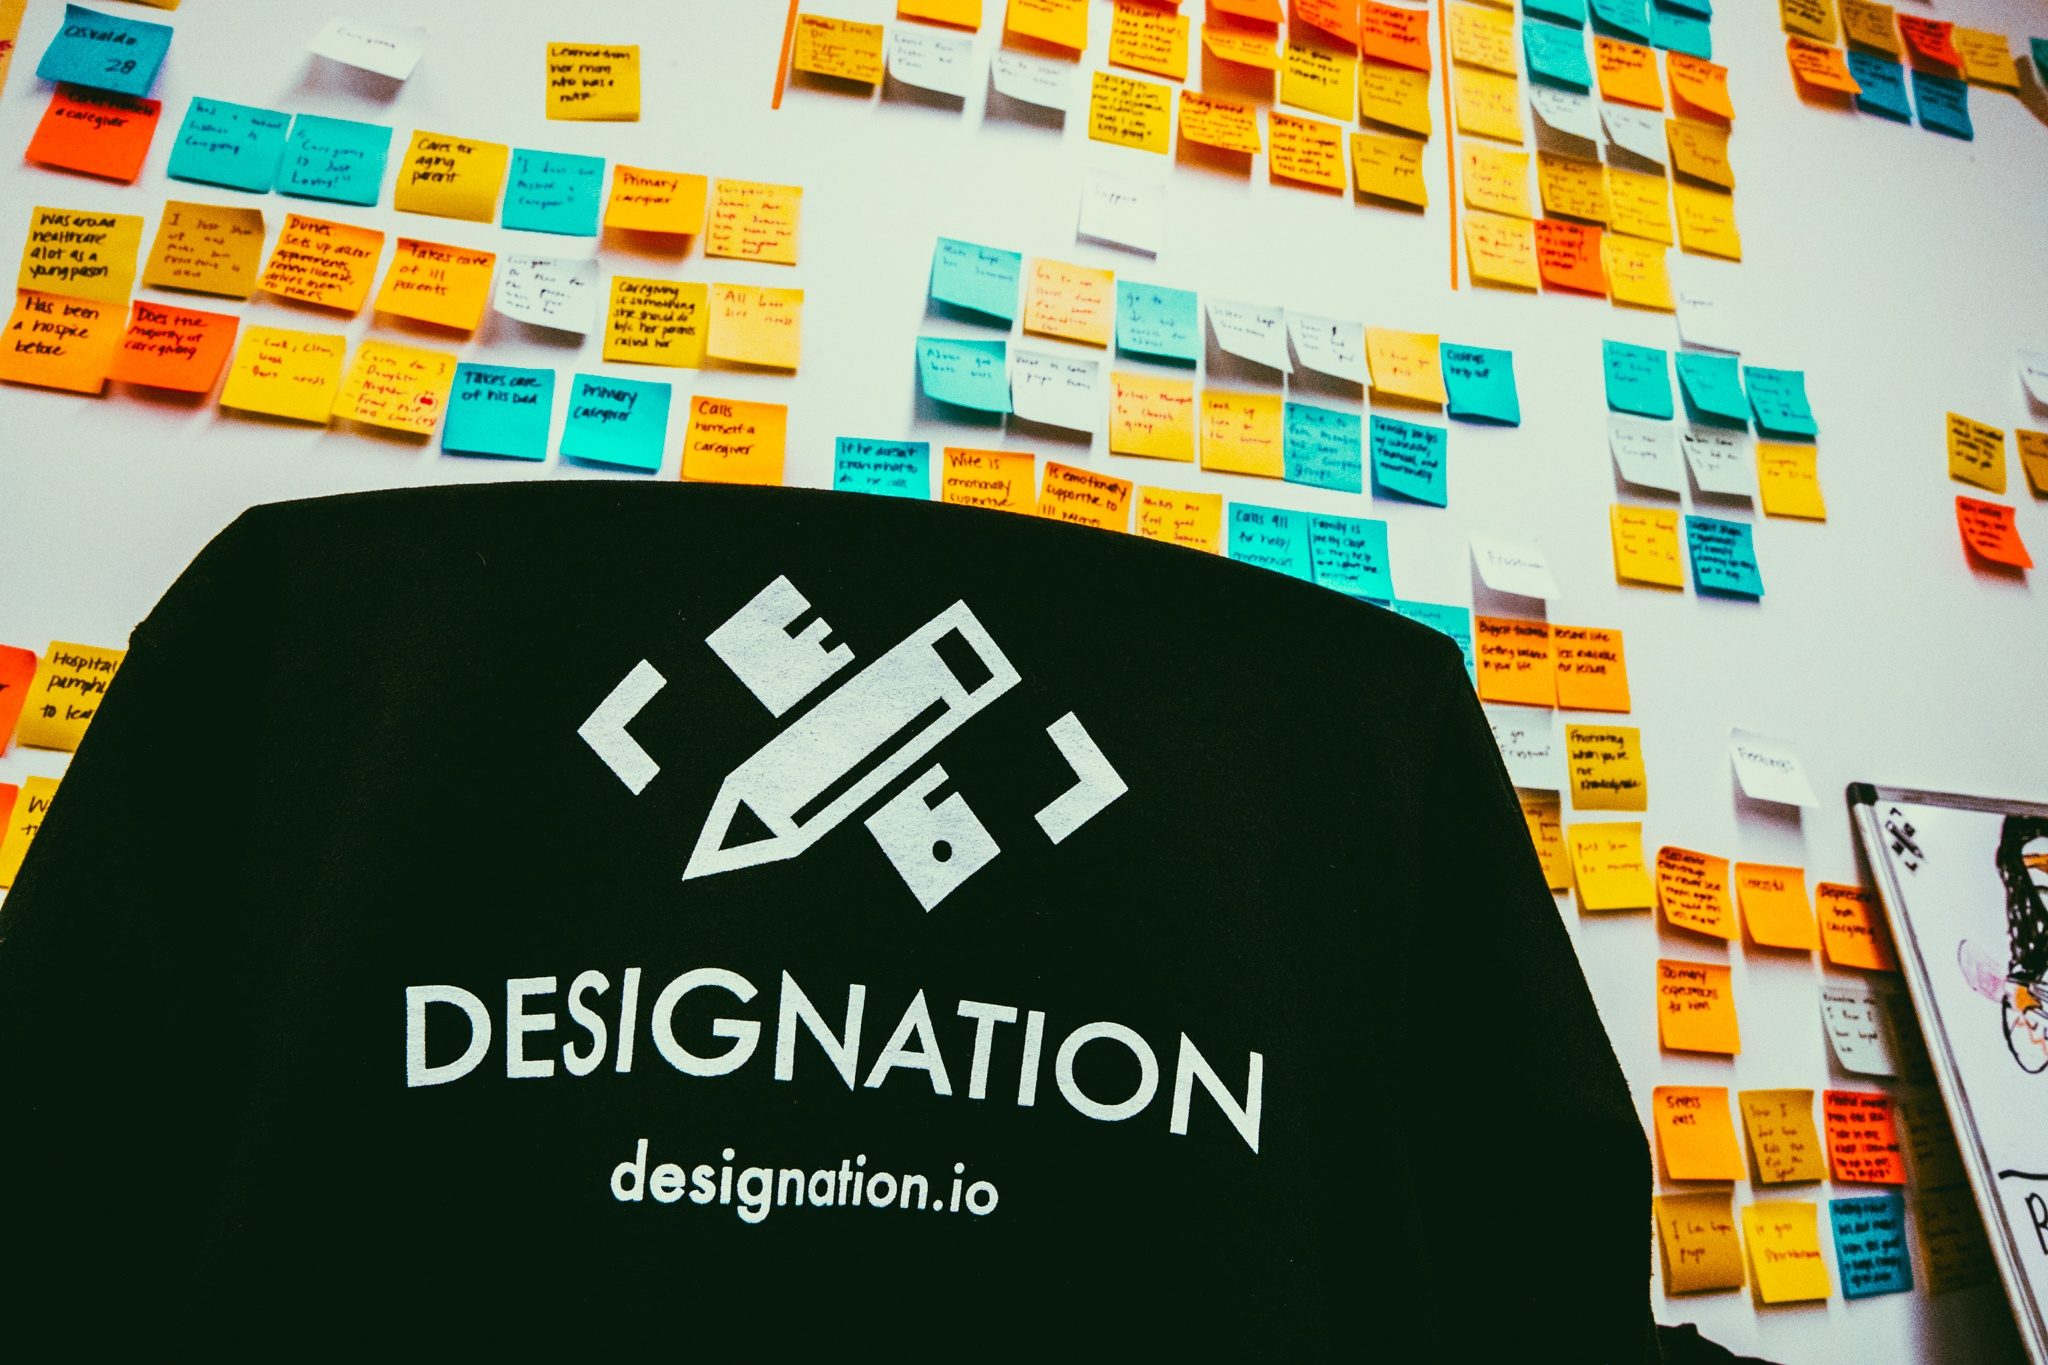 Designation-4.jpg